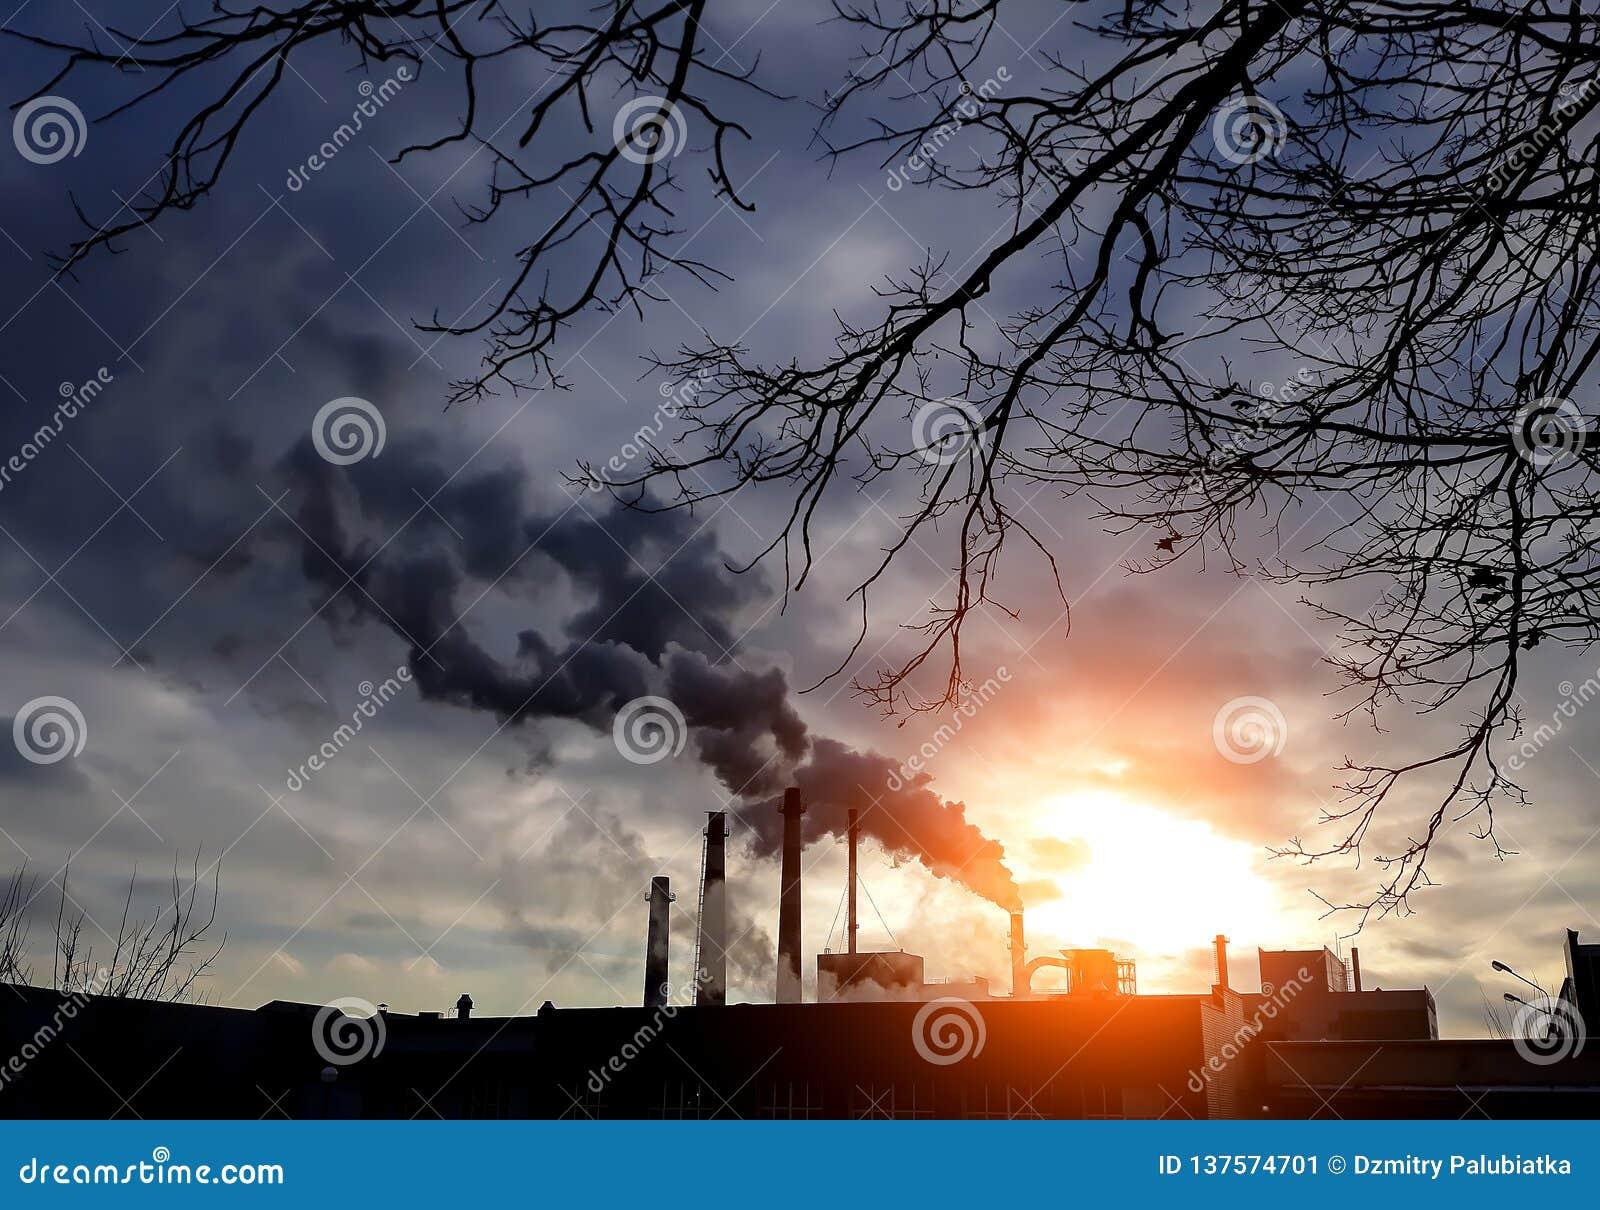 Chaminés da fábrica com fumo preto Chaminés da fábrica Poluição do ar Conceito da poluição do ambiente Conceito do desastre ecoló